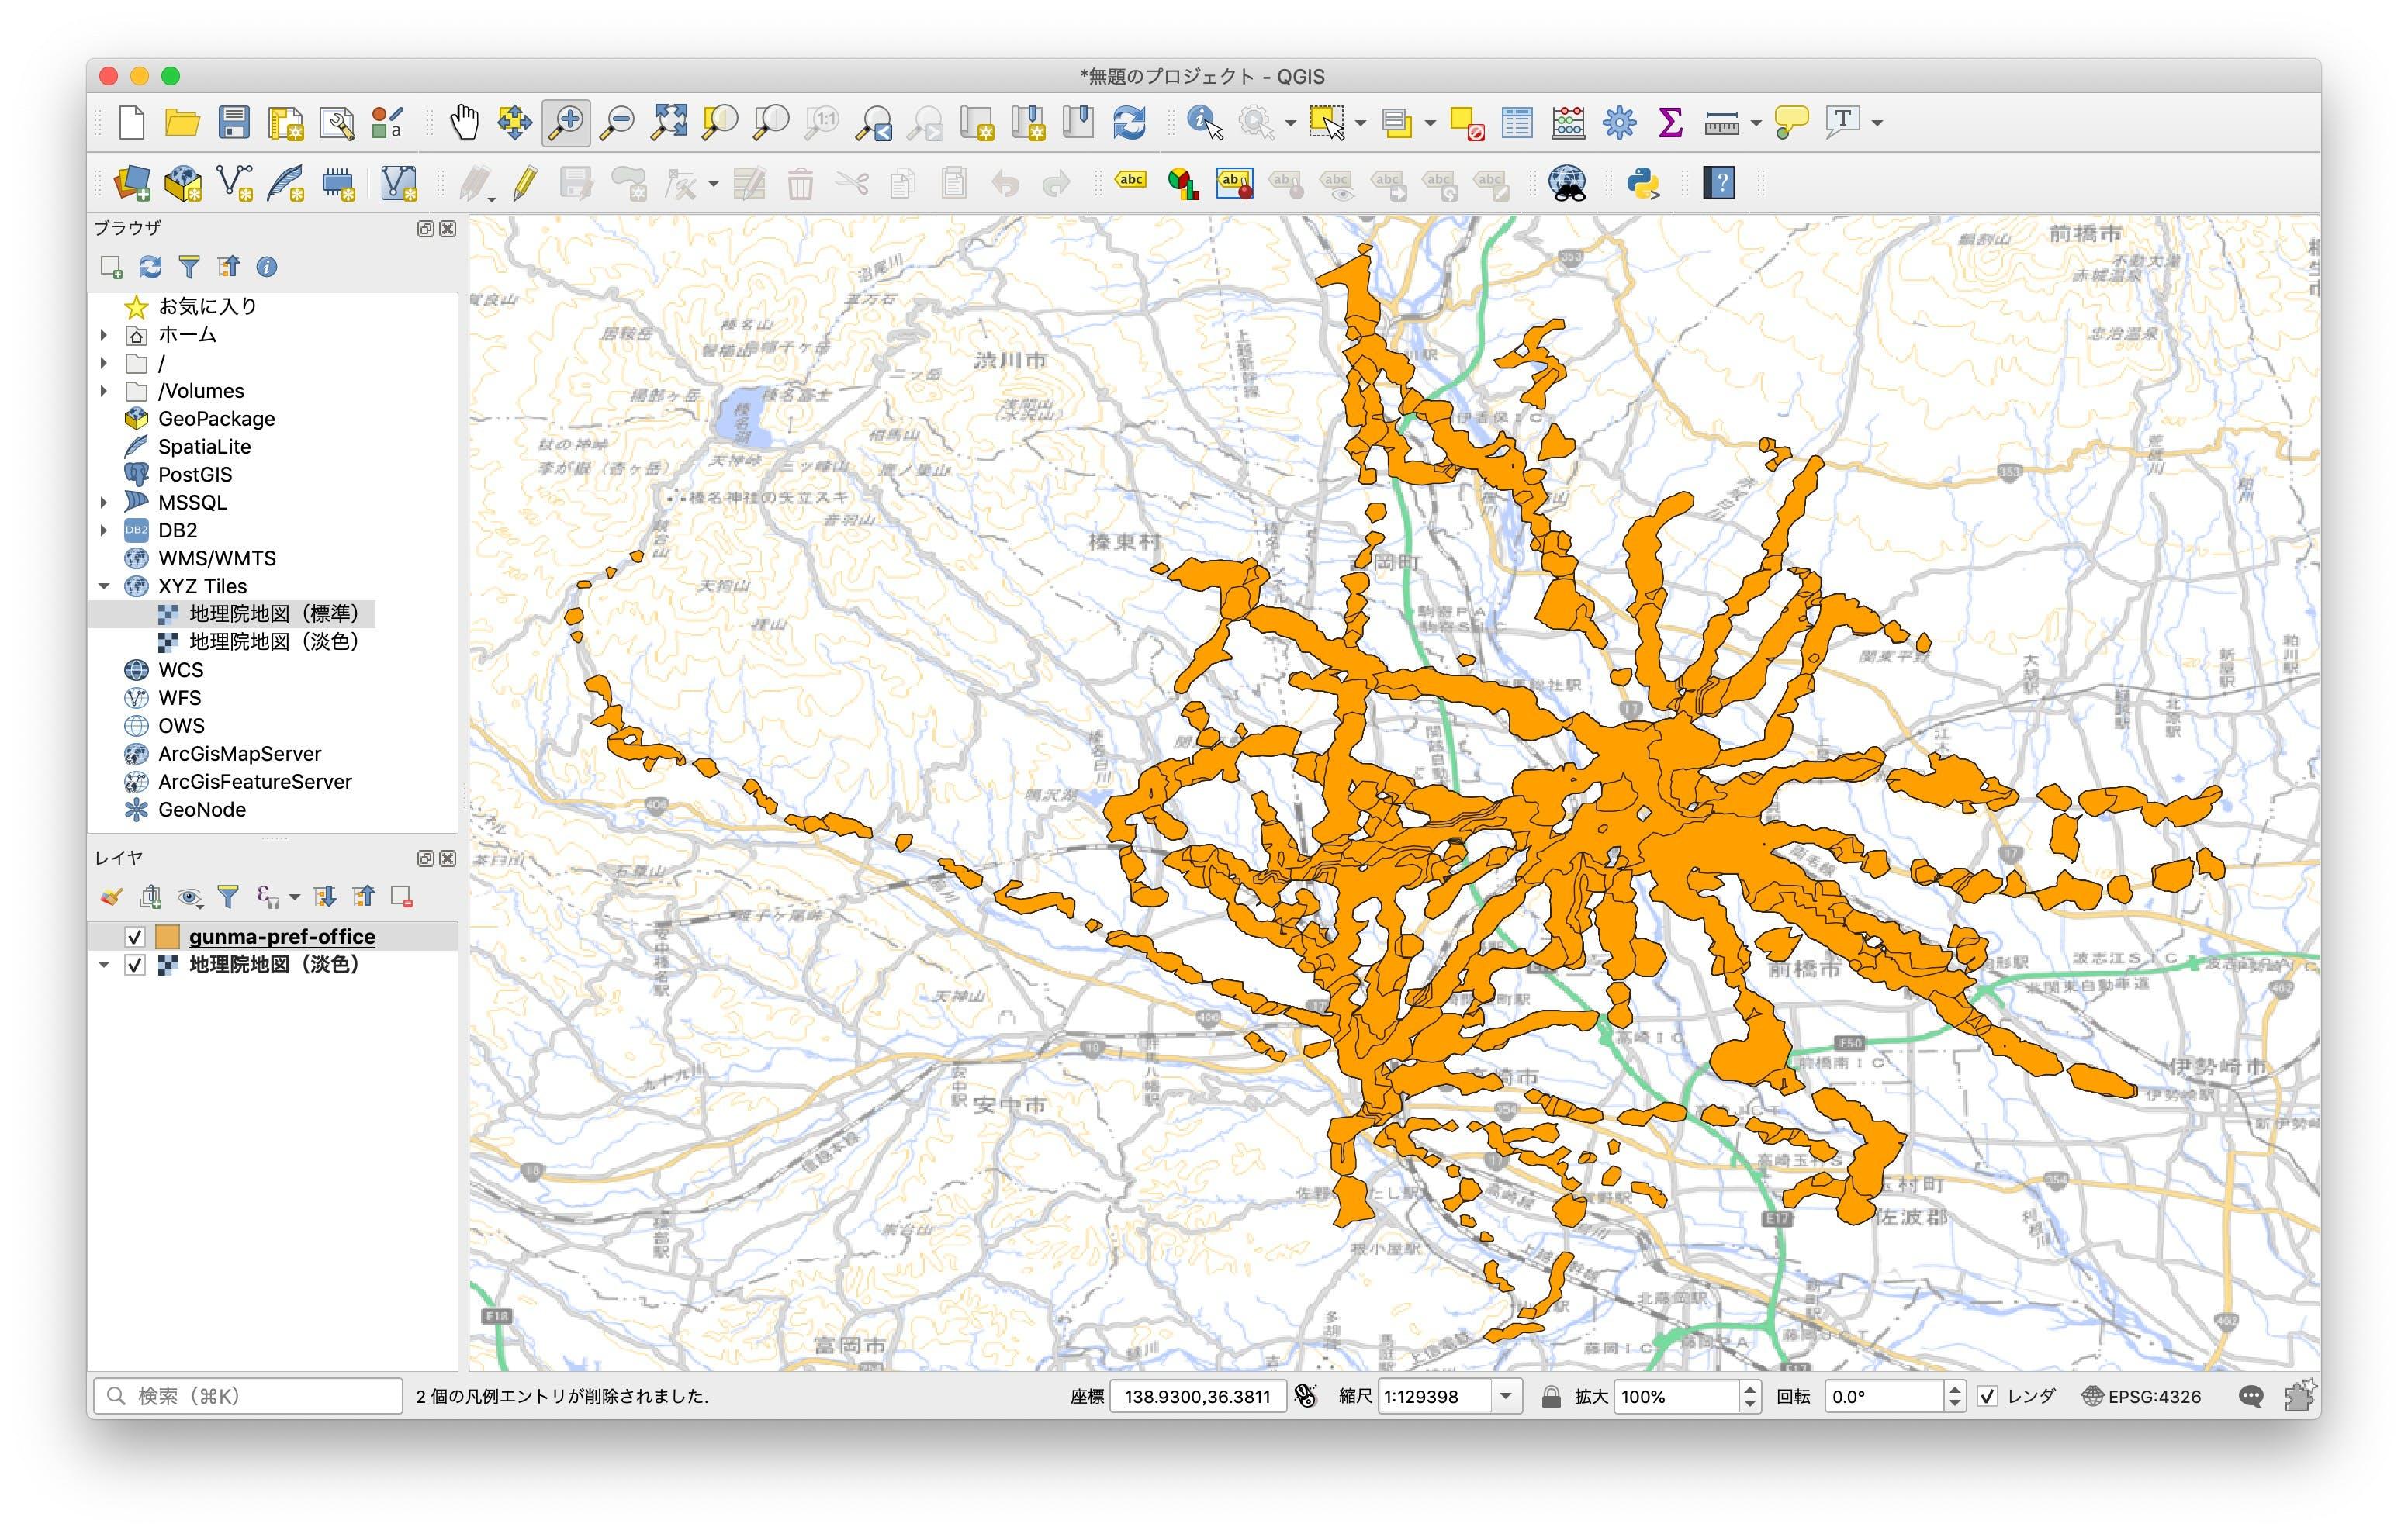 GeoJSONと地理院地図を重ねた表示